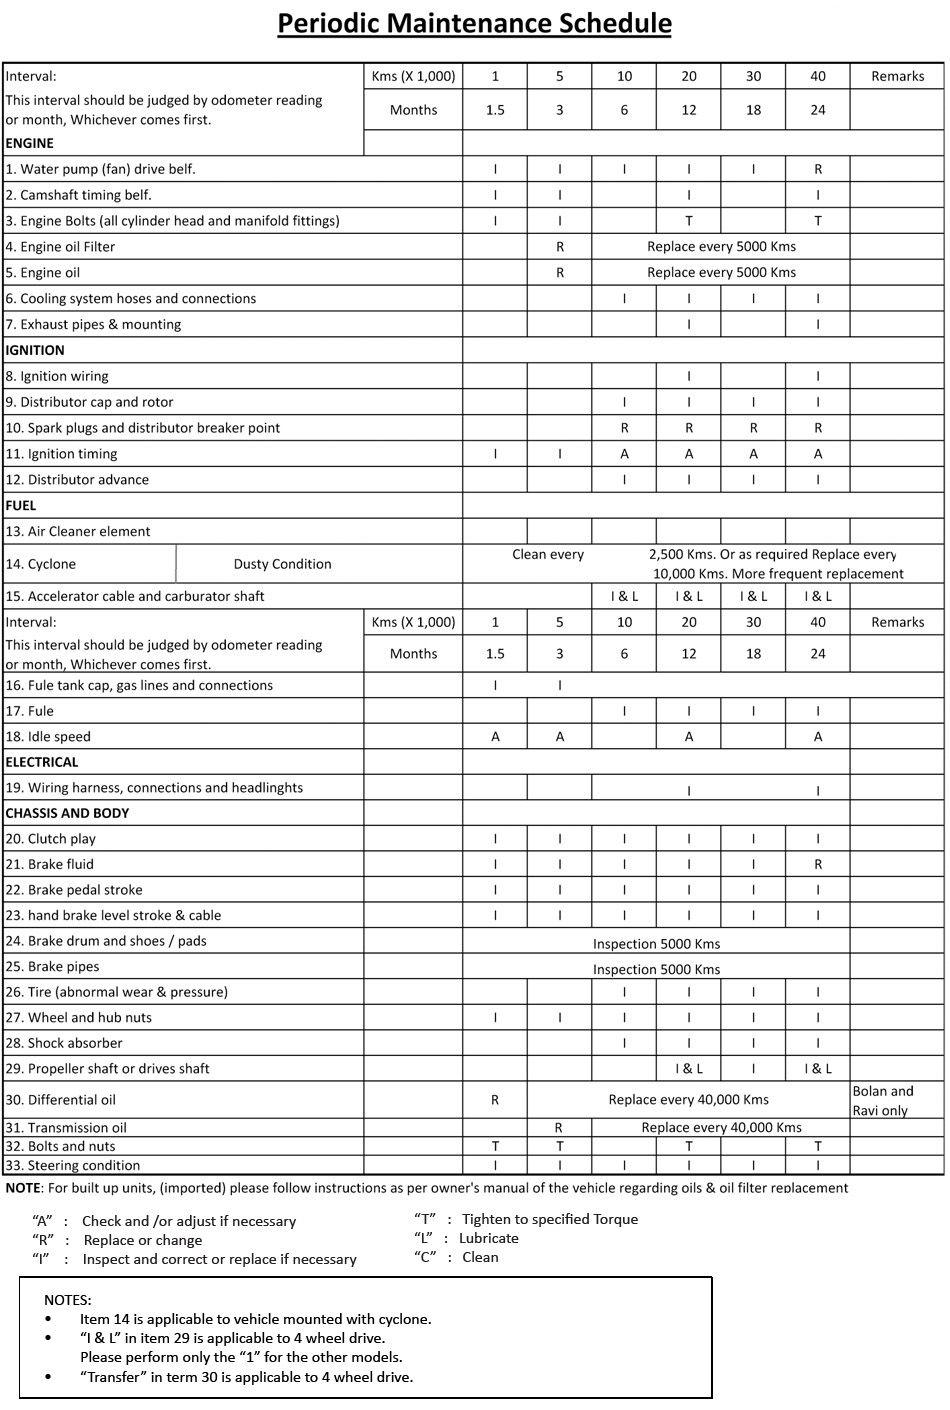 Automotive Wolf Car Maintenance Software For Windows Car Maintenance Checklist Template Maintenance